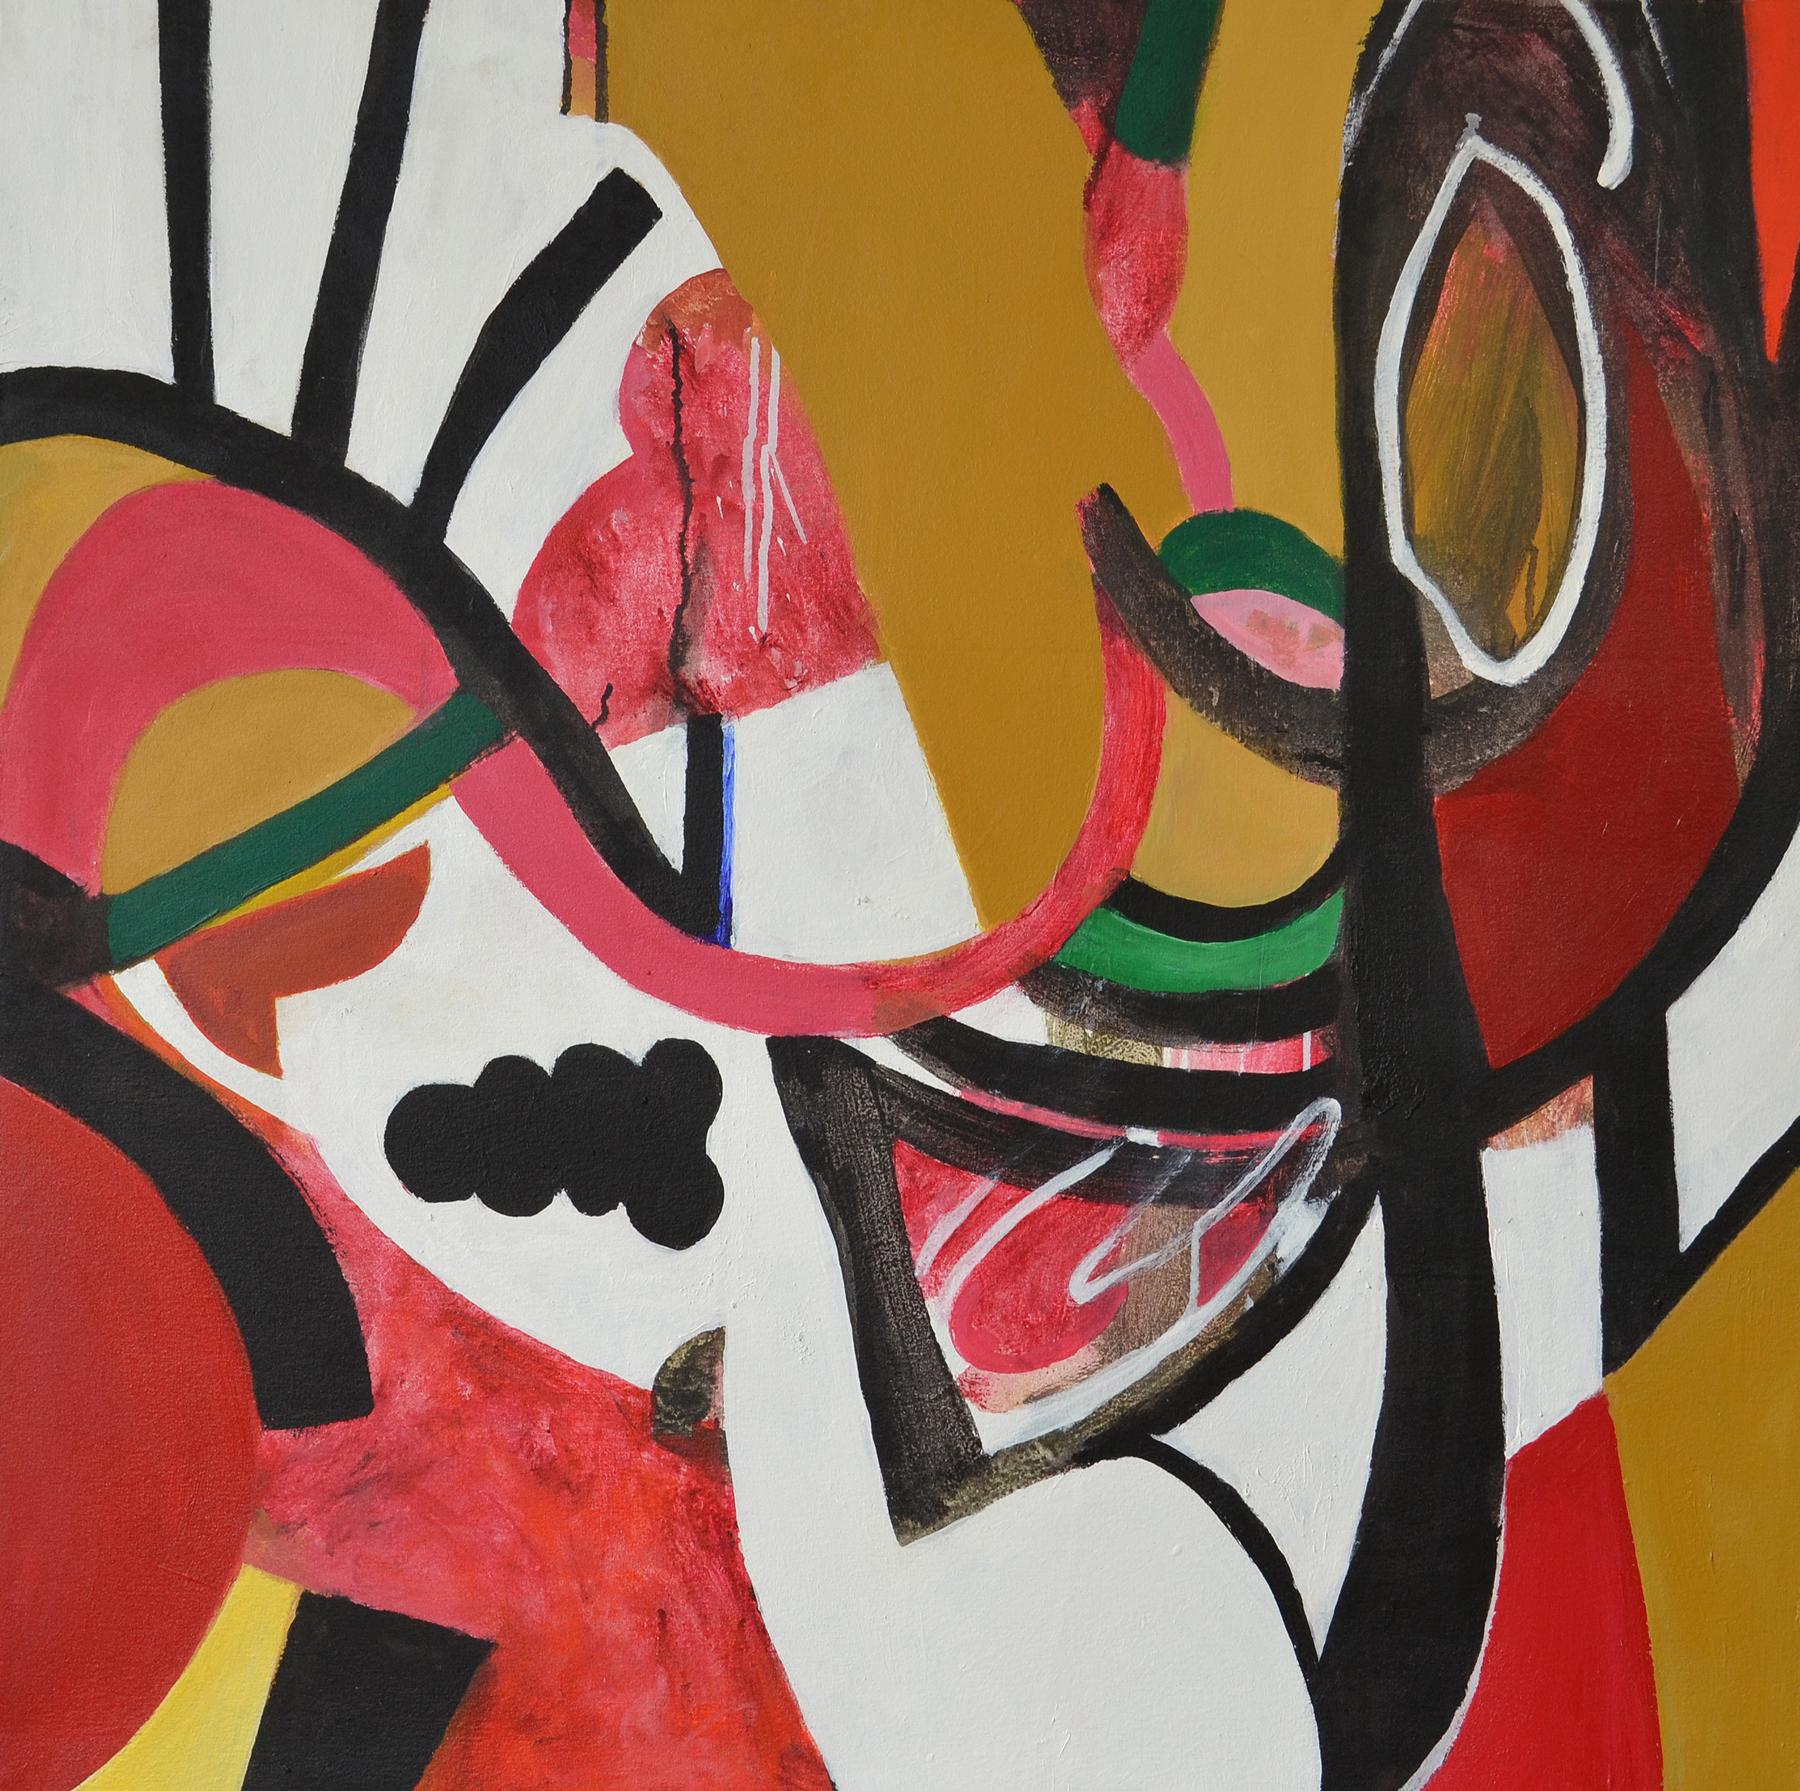 Jazz I , 2005. Acrylic on canvas, 46 x 44 in. (117 x 112 cm.)